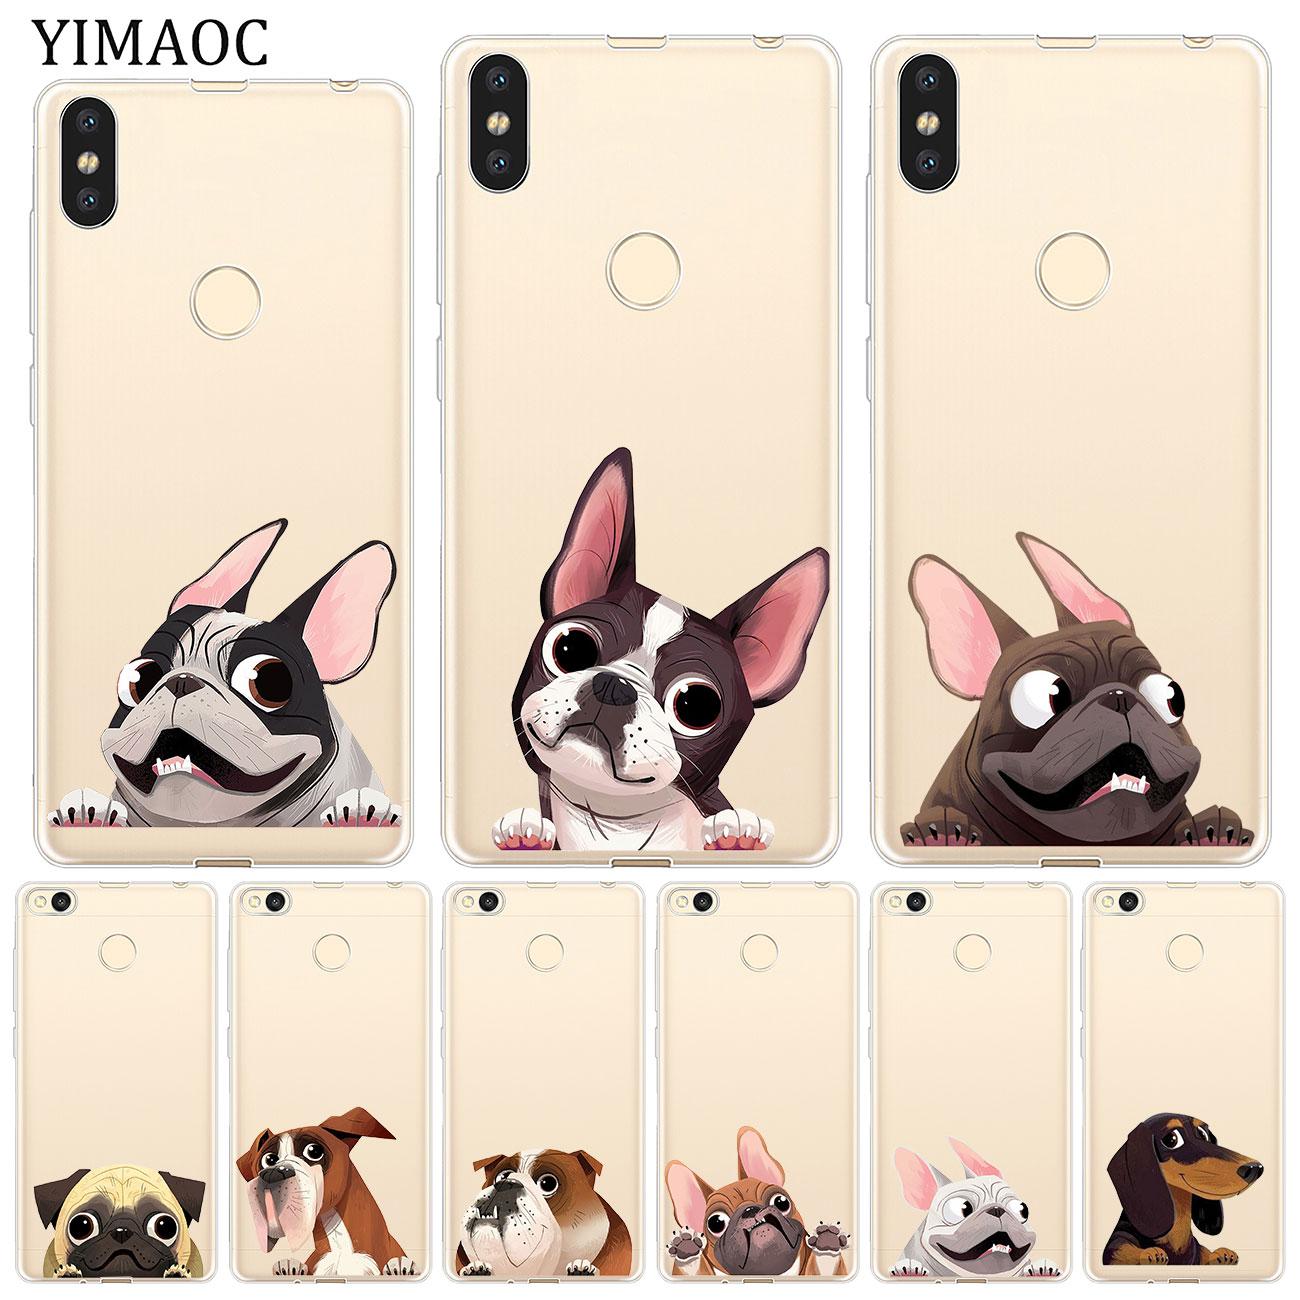 YIMAOC Cute Pug Dog Cartoon  Bulldog Soft Case for Xiaomi Redmi K20 8A 7A 6A 5A 4A 4X S2 GO Note 8 7 6 5 Pro Plus 4 Cover